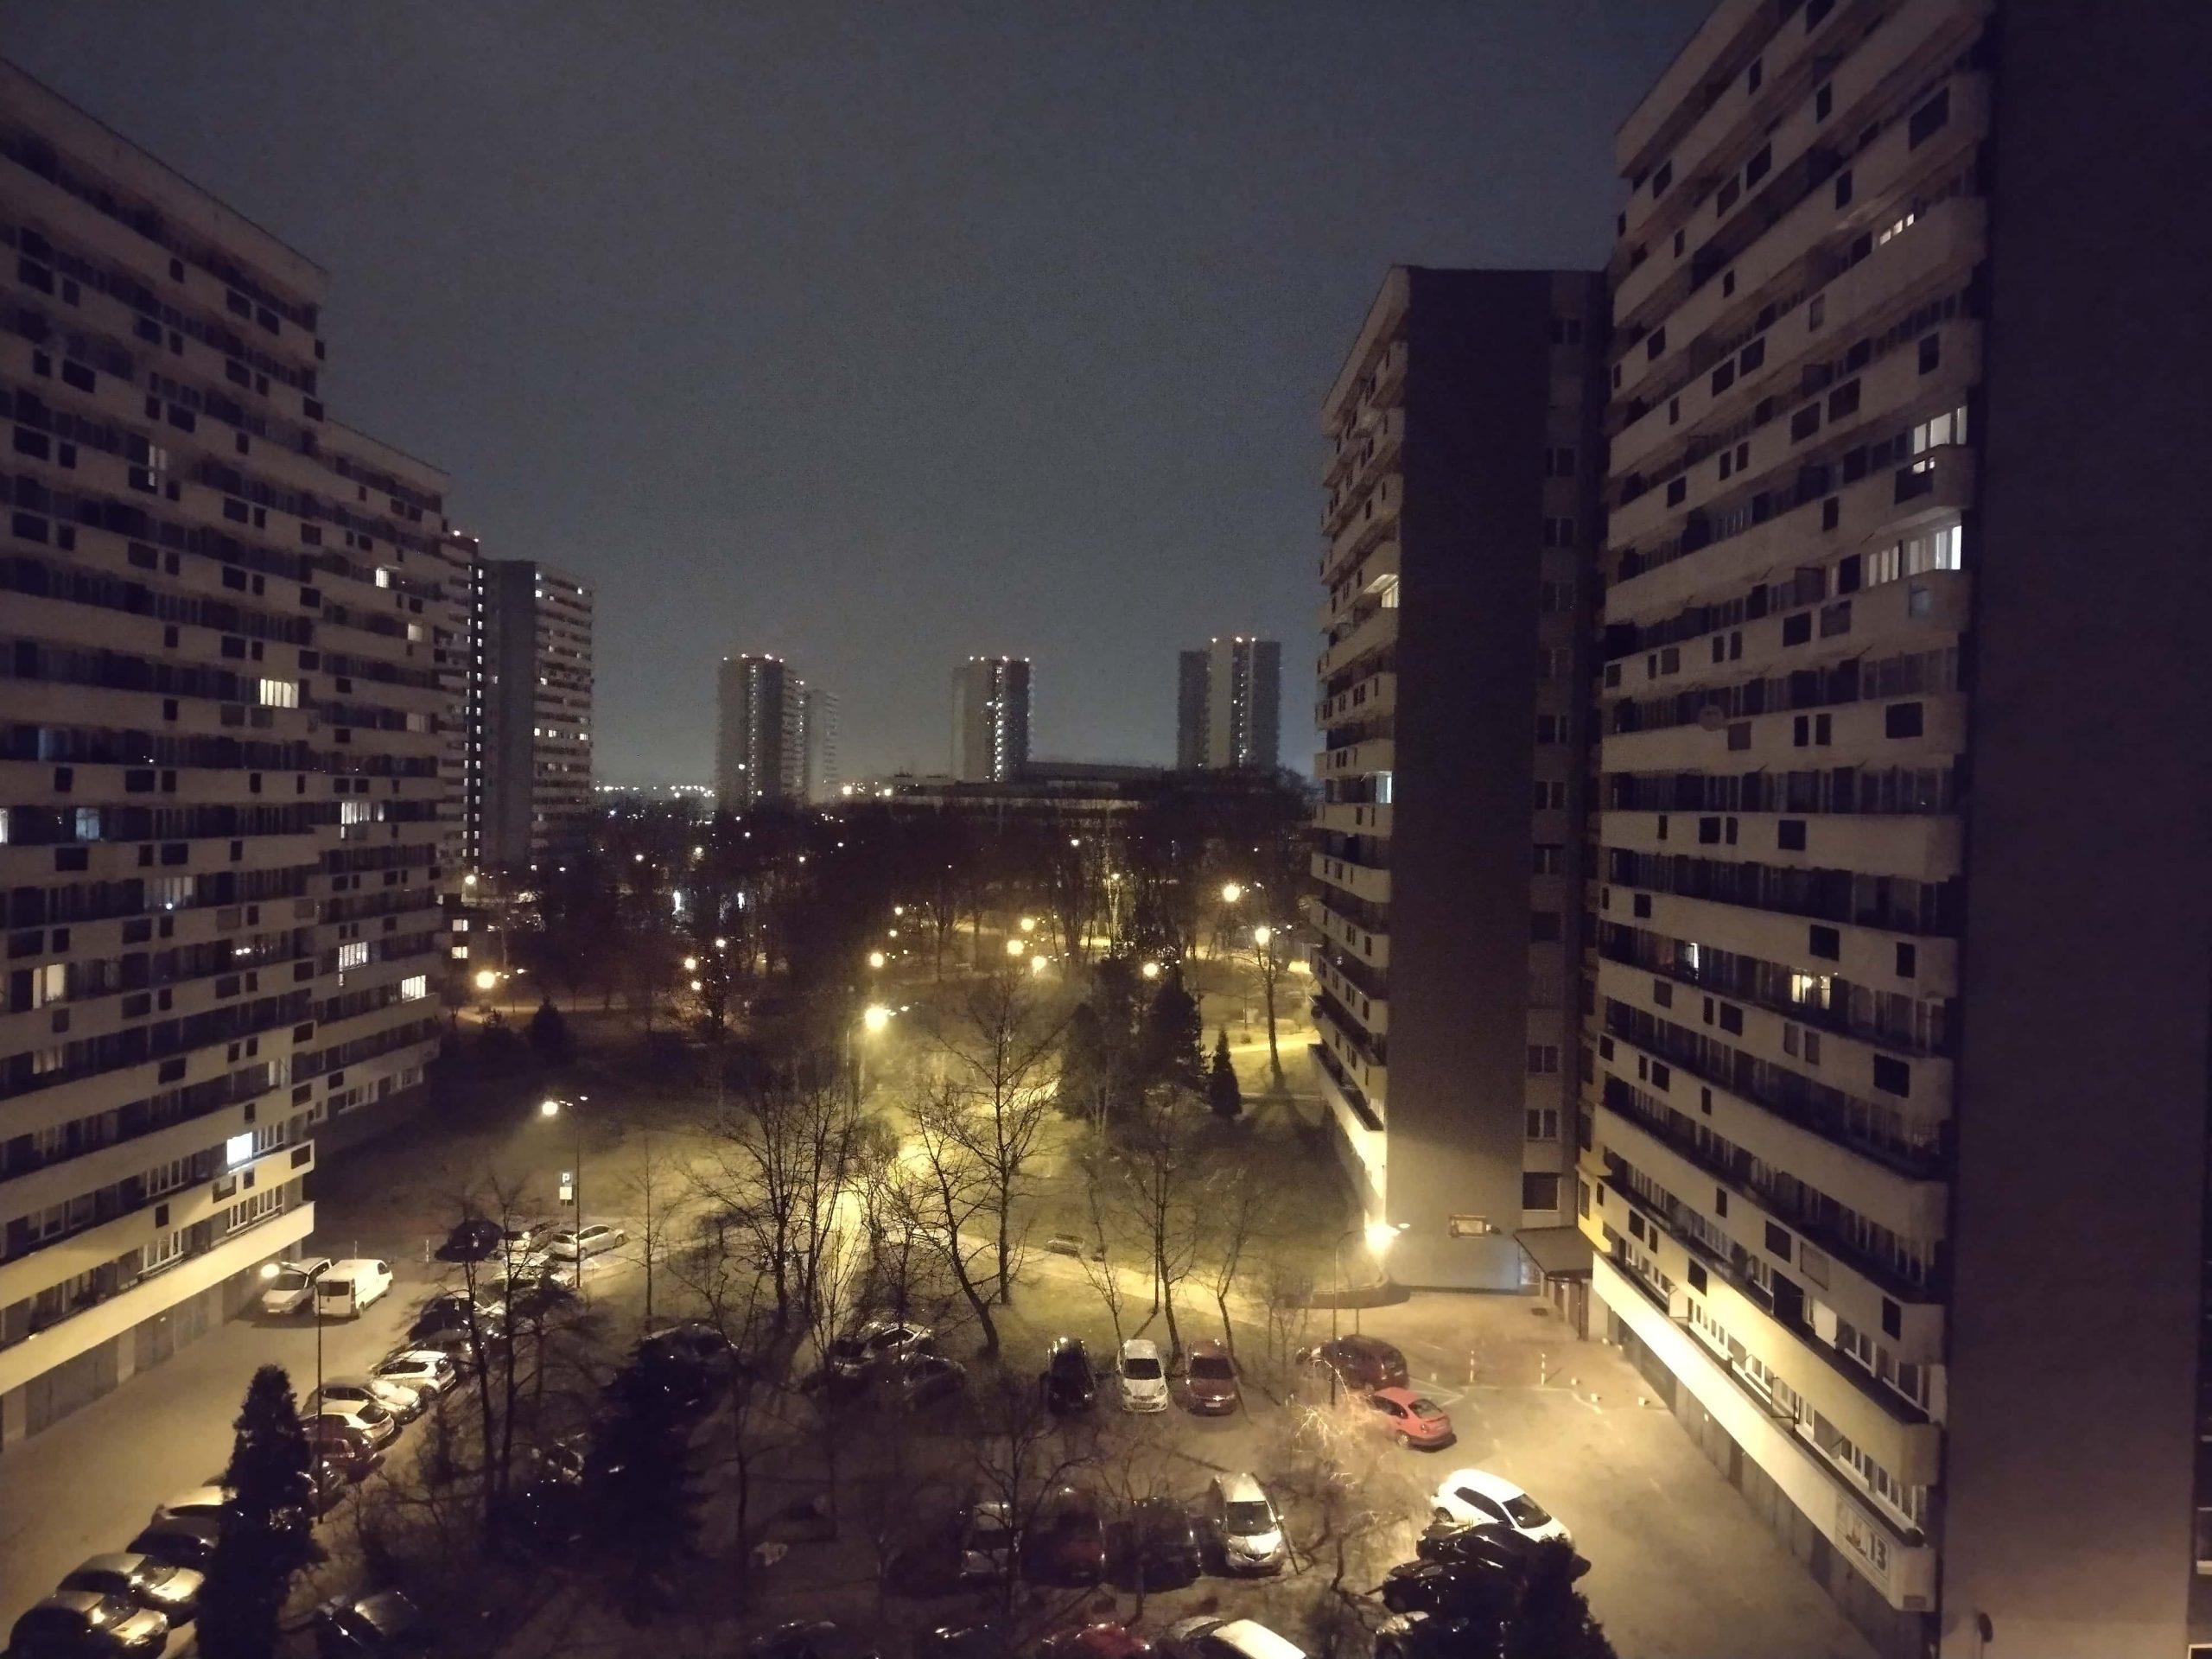 Zdjęcia nocne - Motorola Moto G10